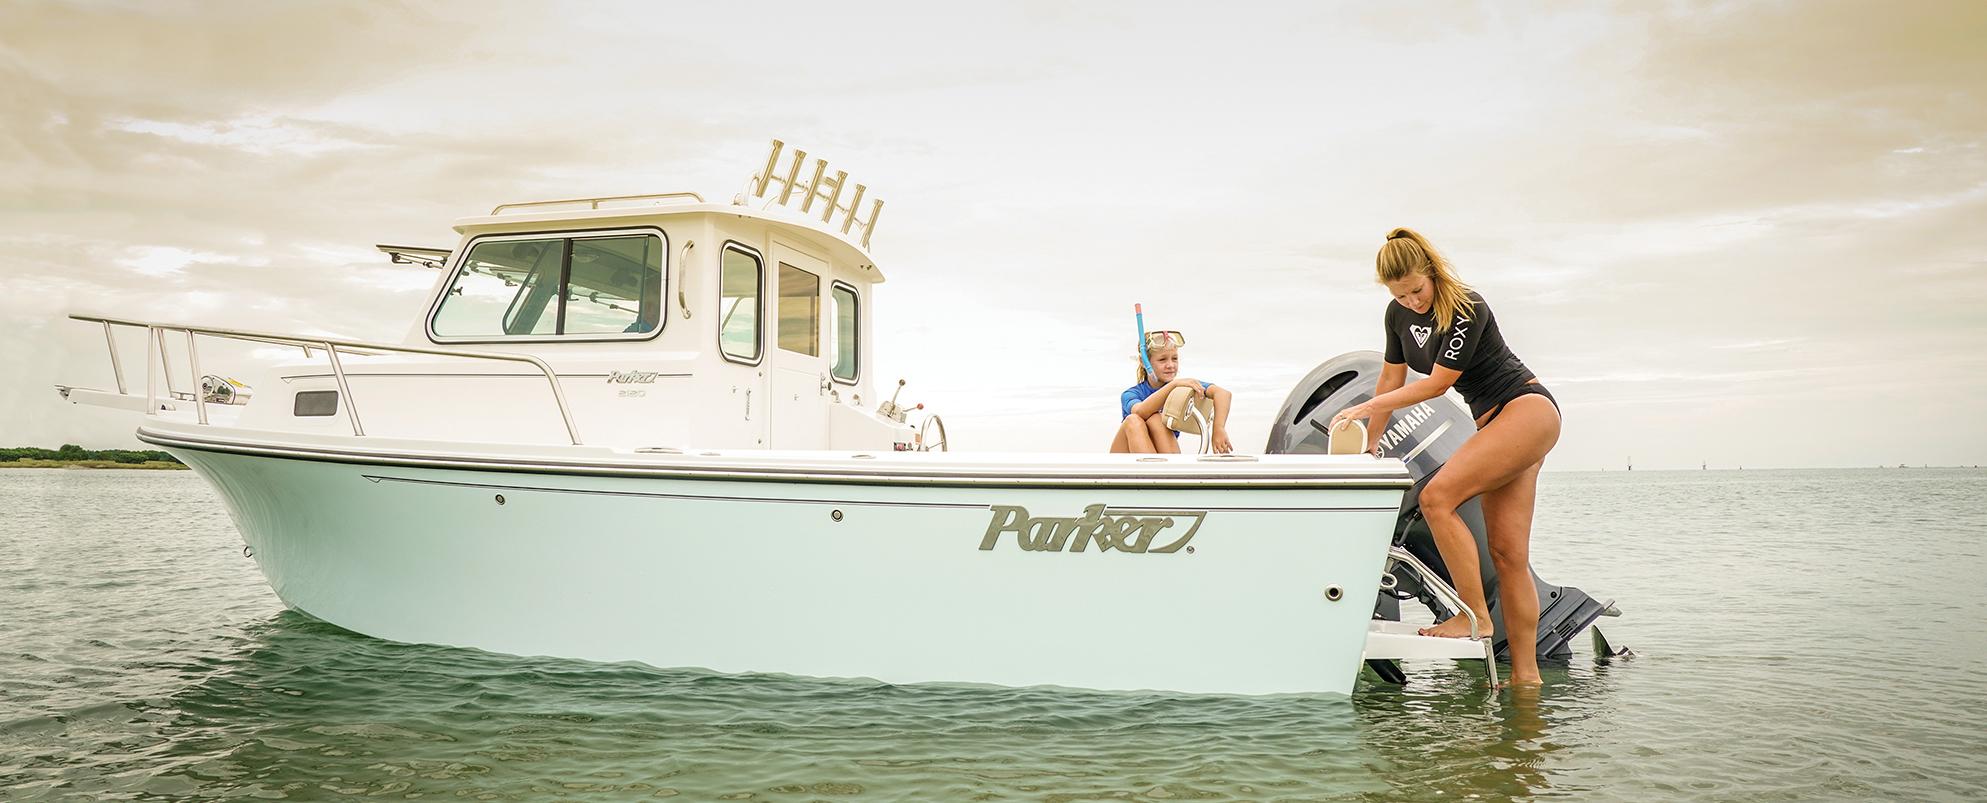 Parker 2120 Sport Cabin - Minimum Size, Maximum Potential